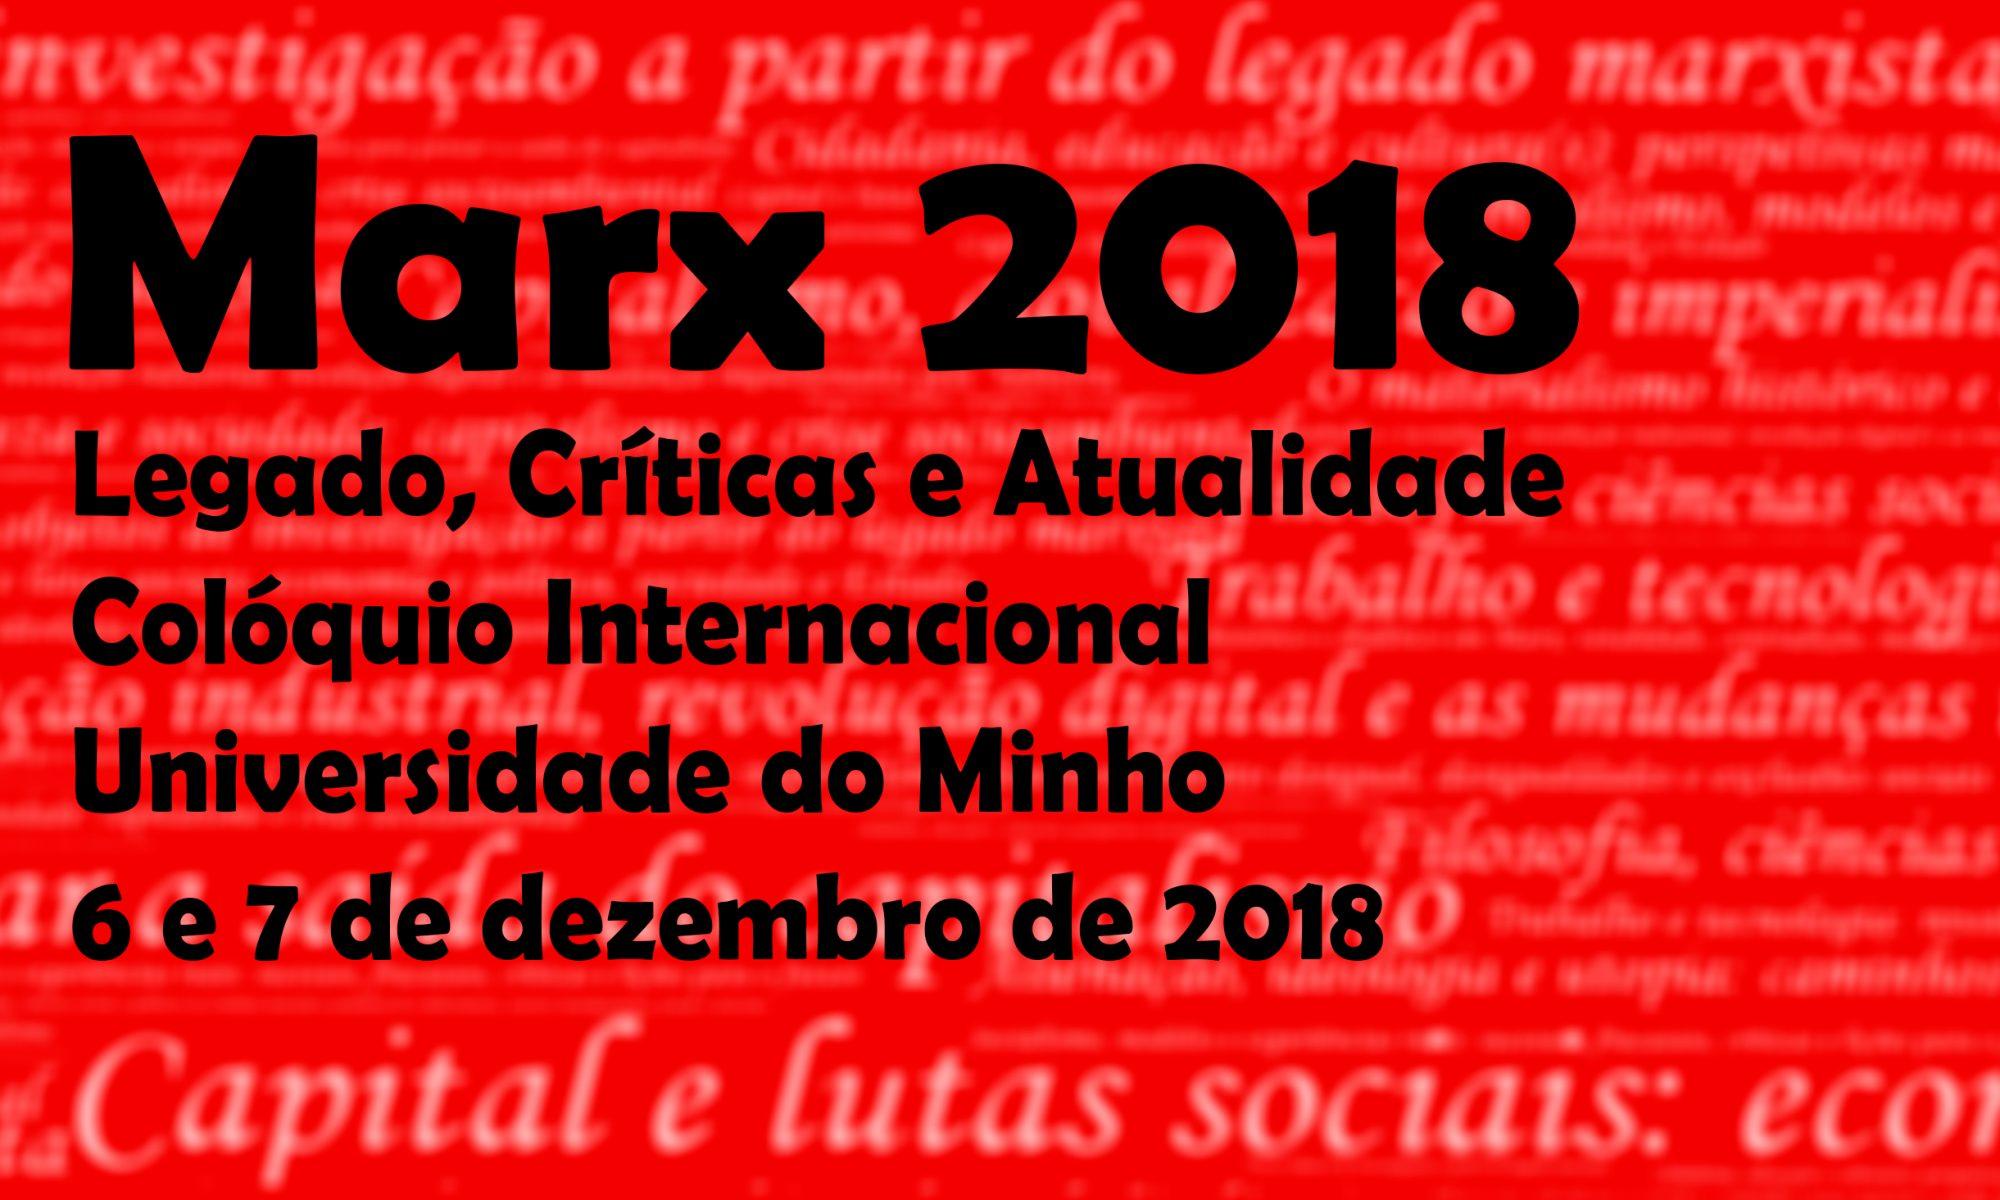 Marx 2018